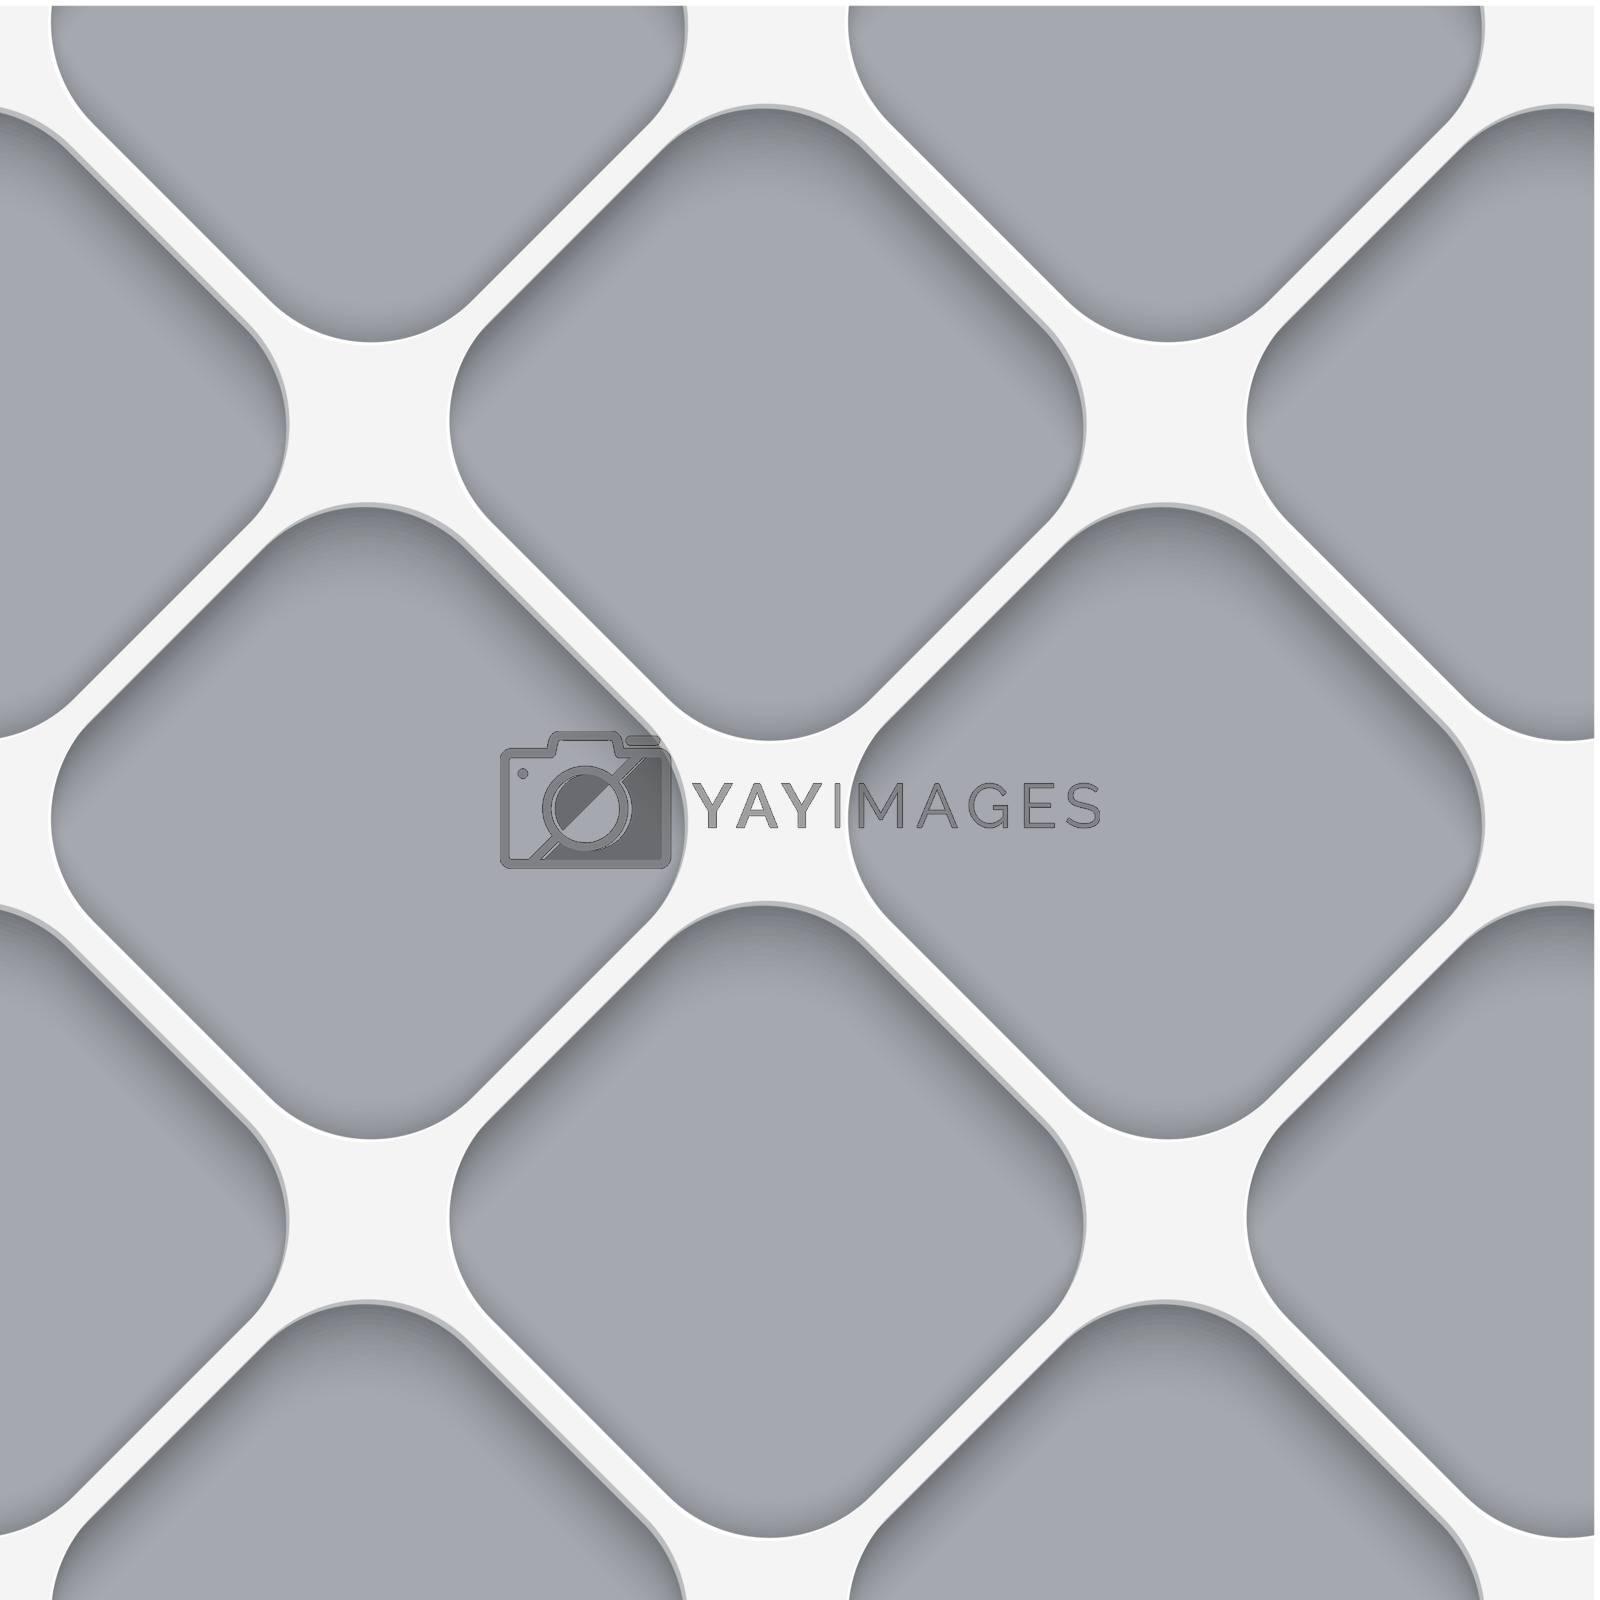 Seamless white diagonal wide square by Zebra-Finch